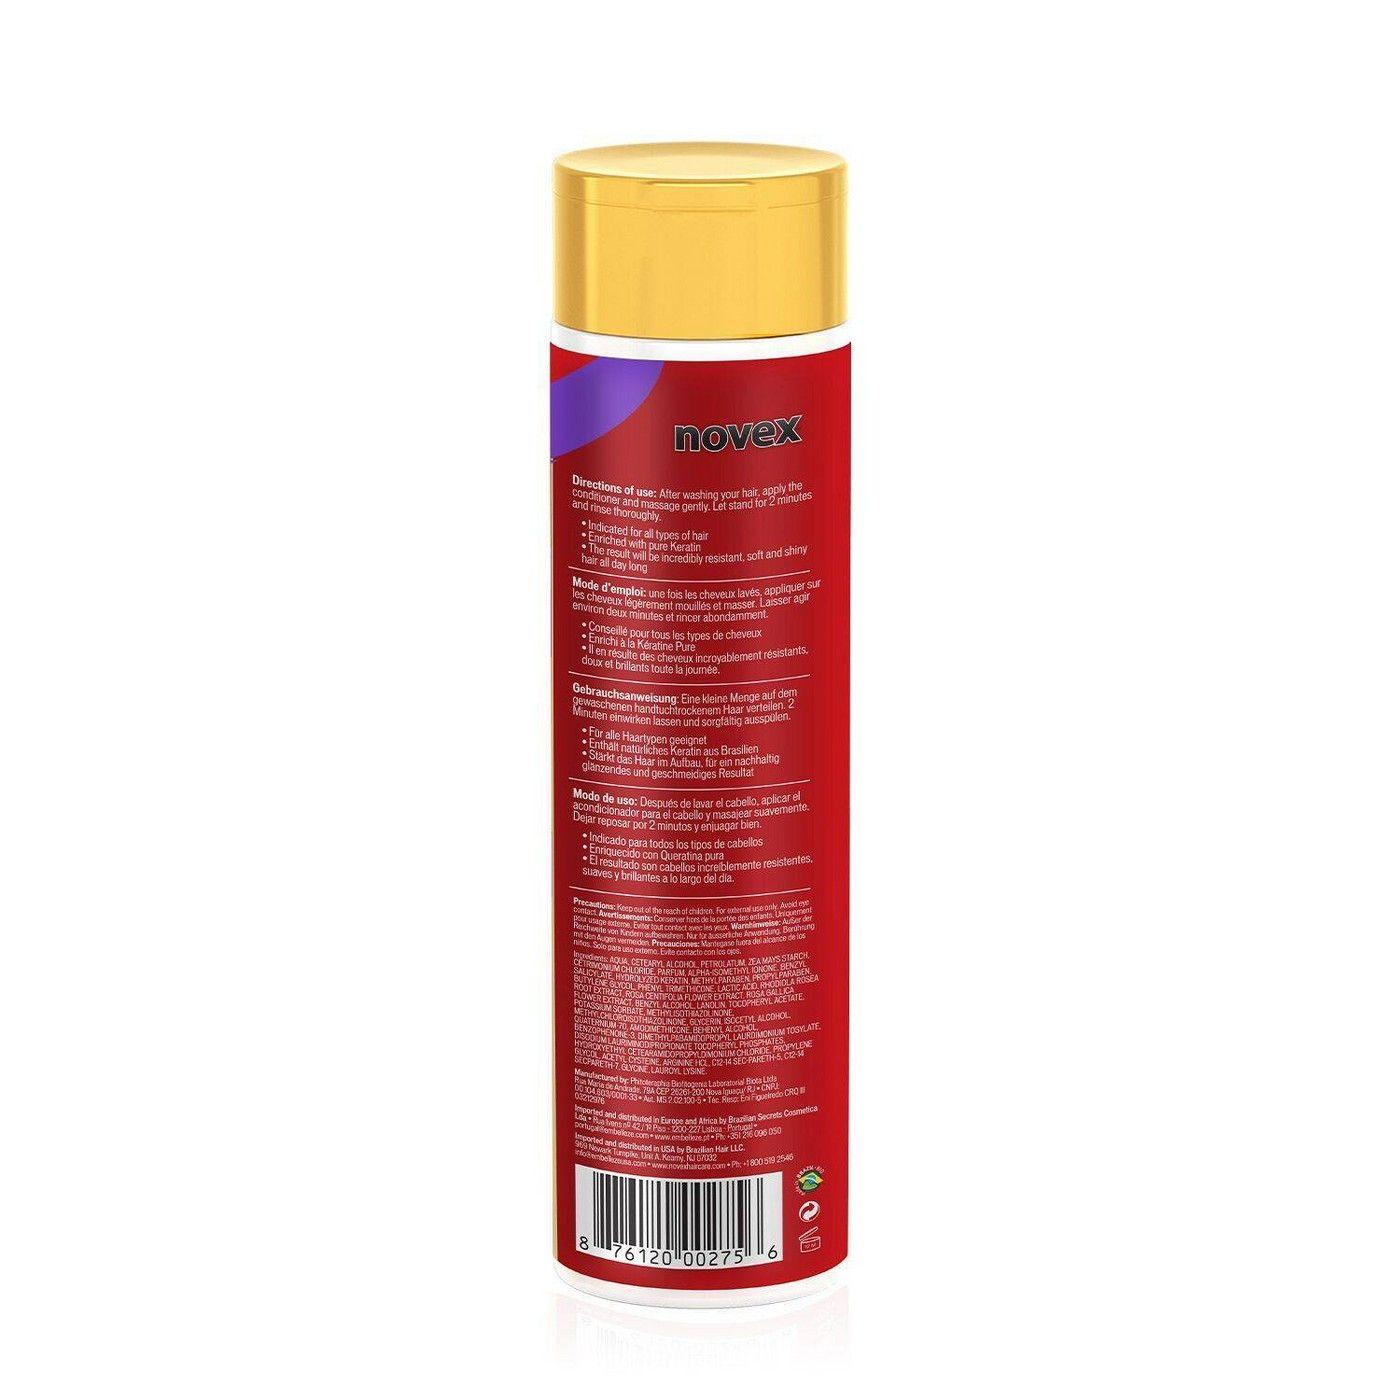 Novex Brazilian Keratin Conditioner 10.1 fl oz